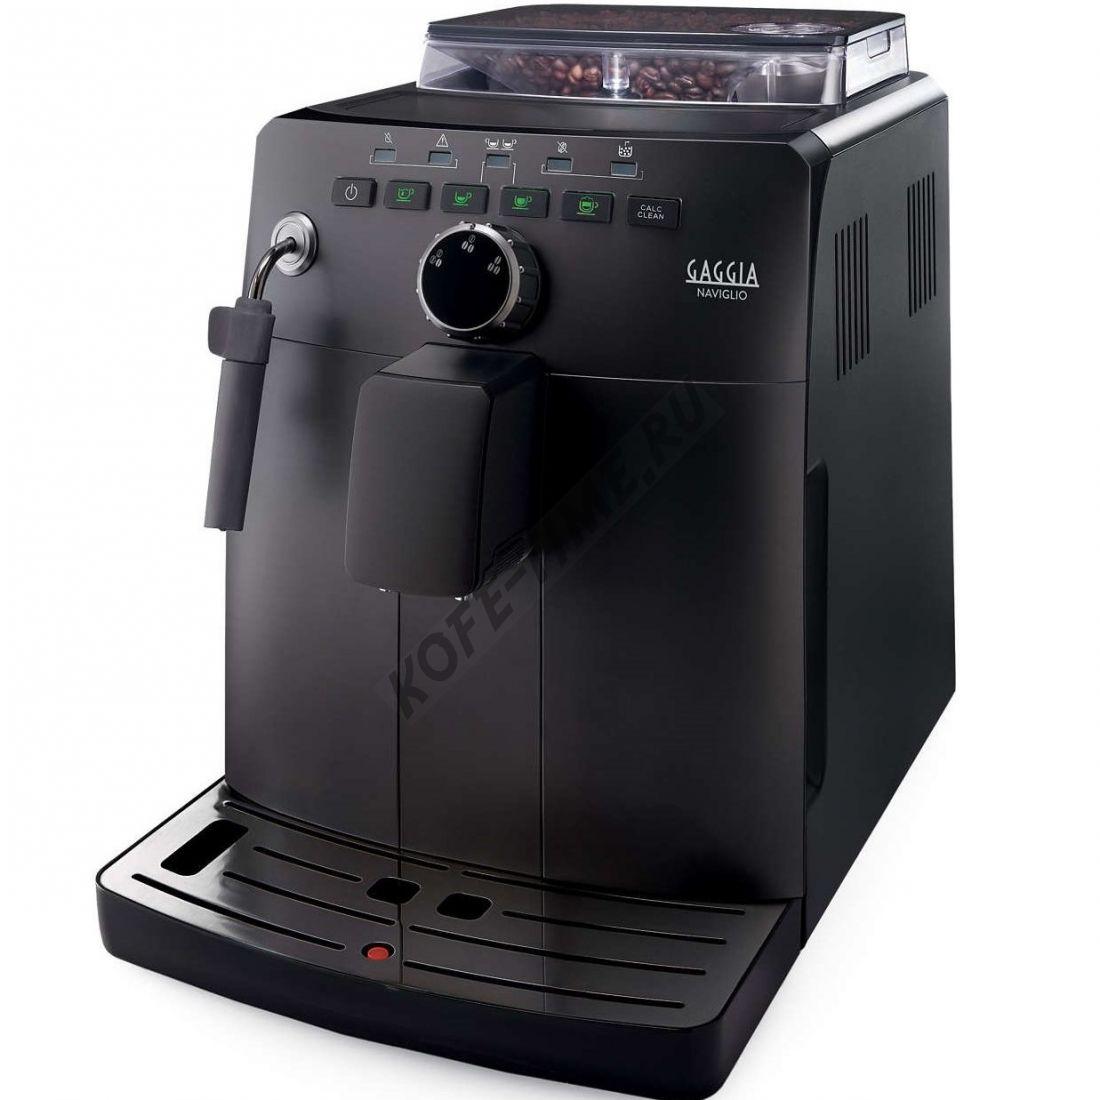 Кофемашина Gaggia Naviglio Black HD 8749/01